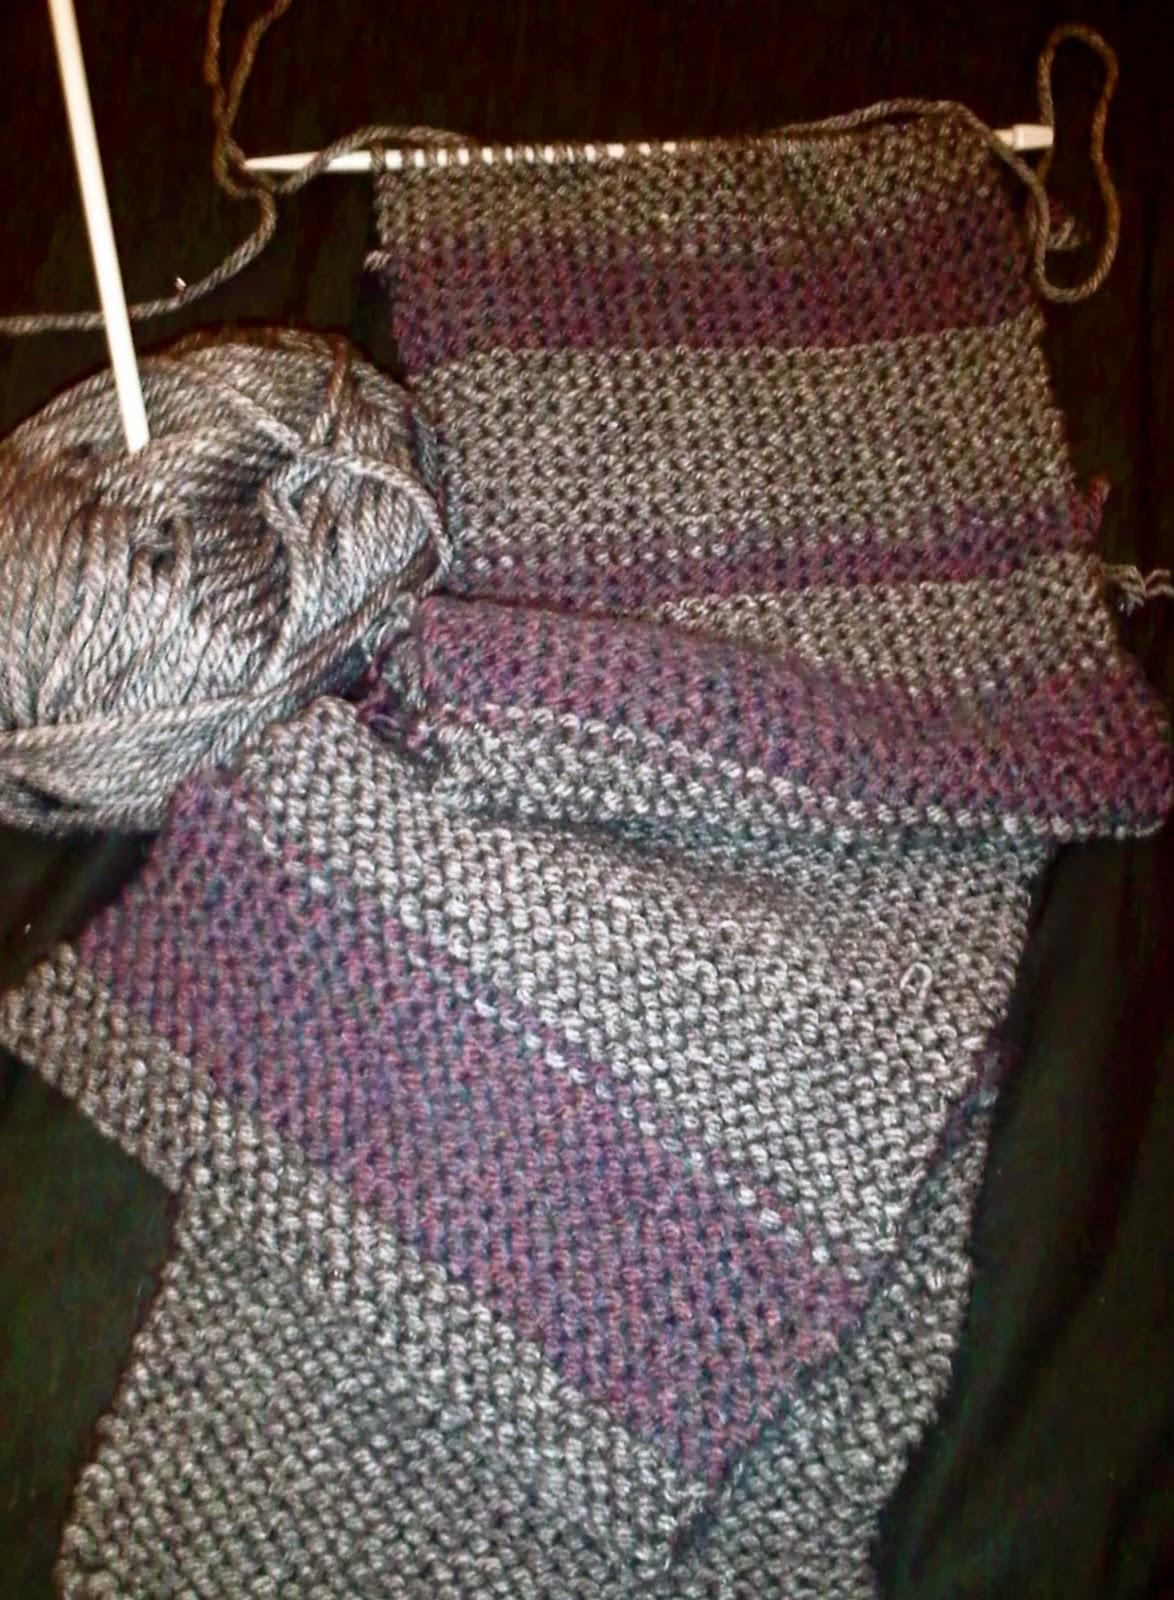 http://4.bp.blogspot.com/_iWW6ixj51MM/TSnw5czxPgI/AAAAAAAAAFs/UthFPkB3rpo/s1600/knitting.jpg